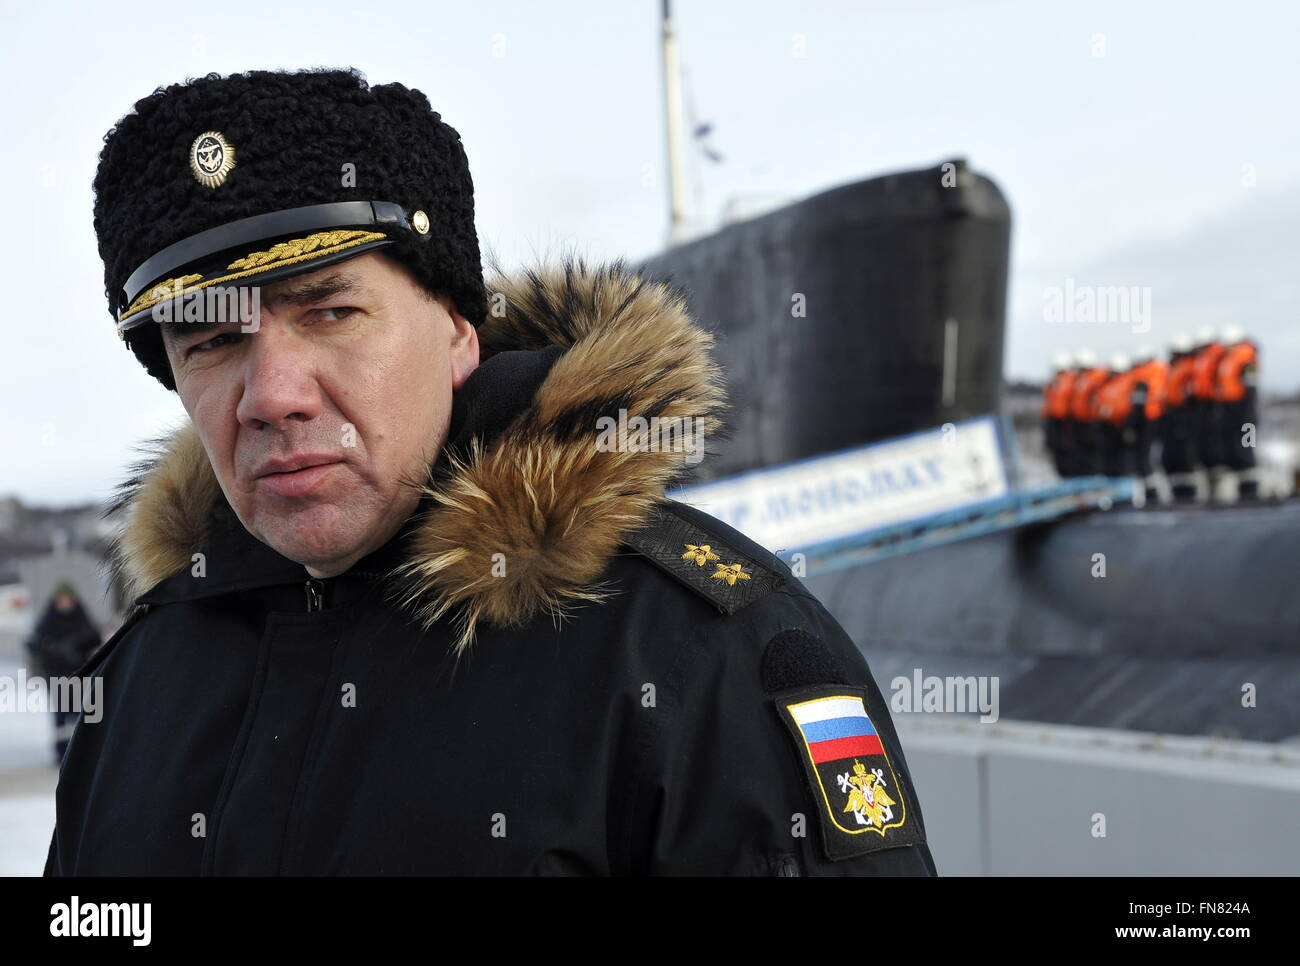 Murmansk Region, Russia. 14th Mar, 2016. Vice Admiral Alexander Moiseyev, Russian Northern Fleet Submarine Forces, - Stock Image